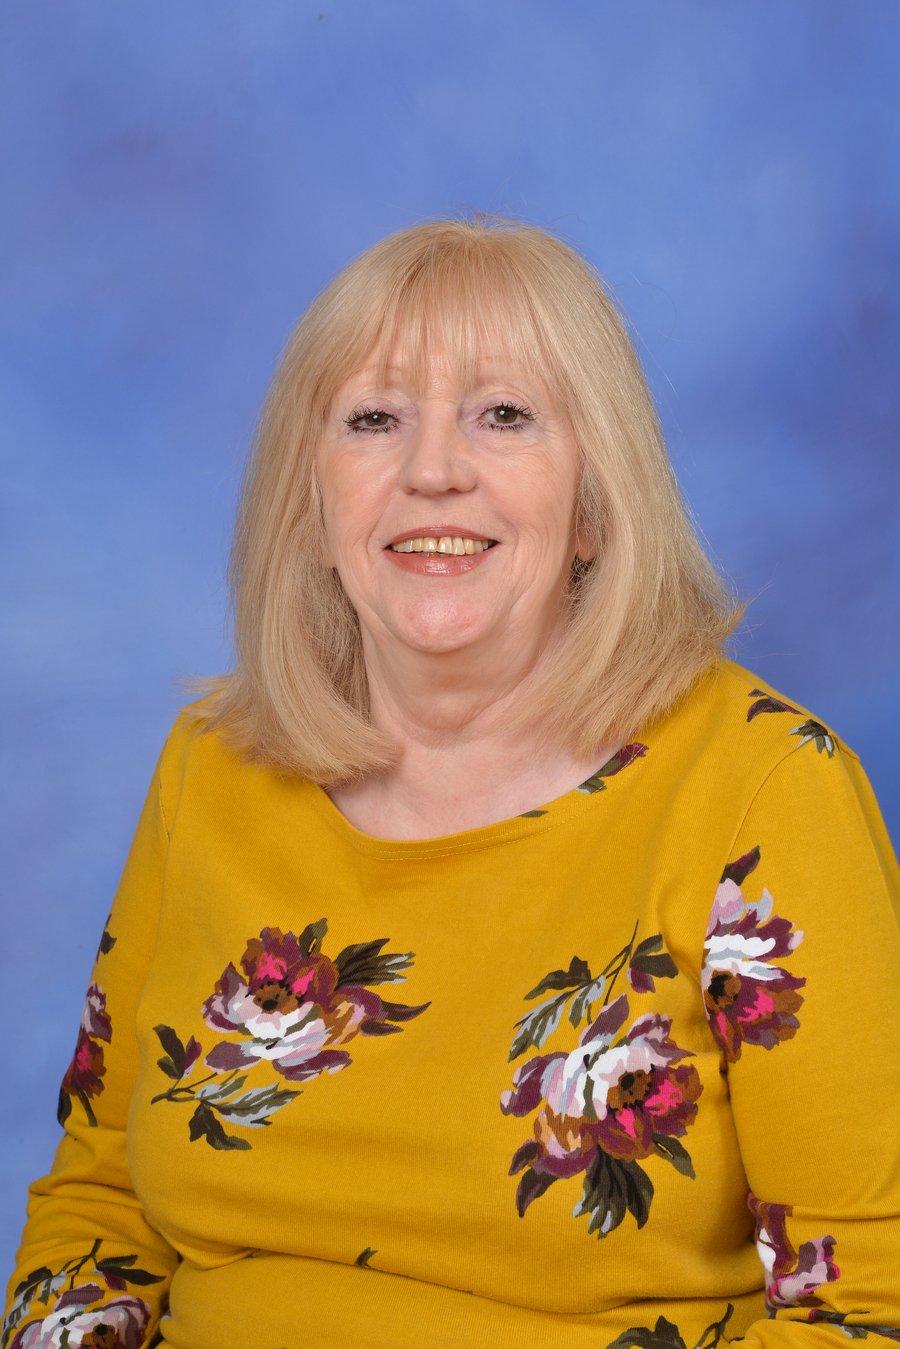 Deputy Designated Safeguarding Lead - Mrs W Clark, Parent Support/Welfare Officer